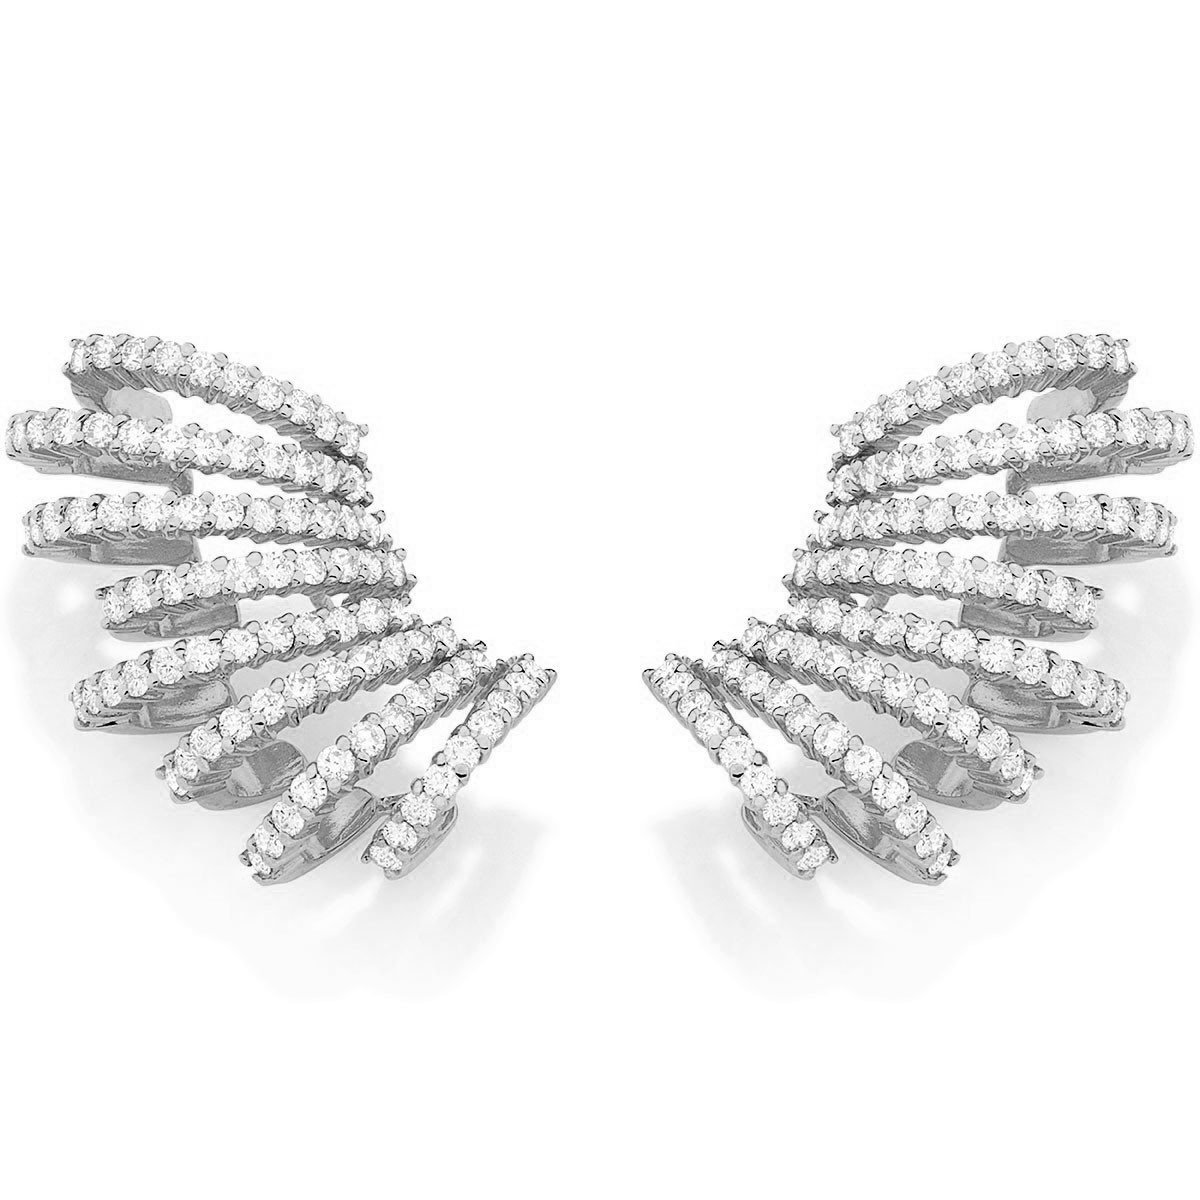 Brinco ear cuff ouro branco 18K com diamantes ac81ab4f5e